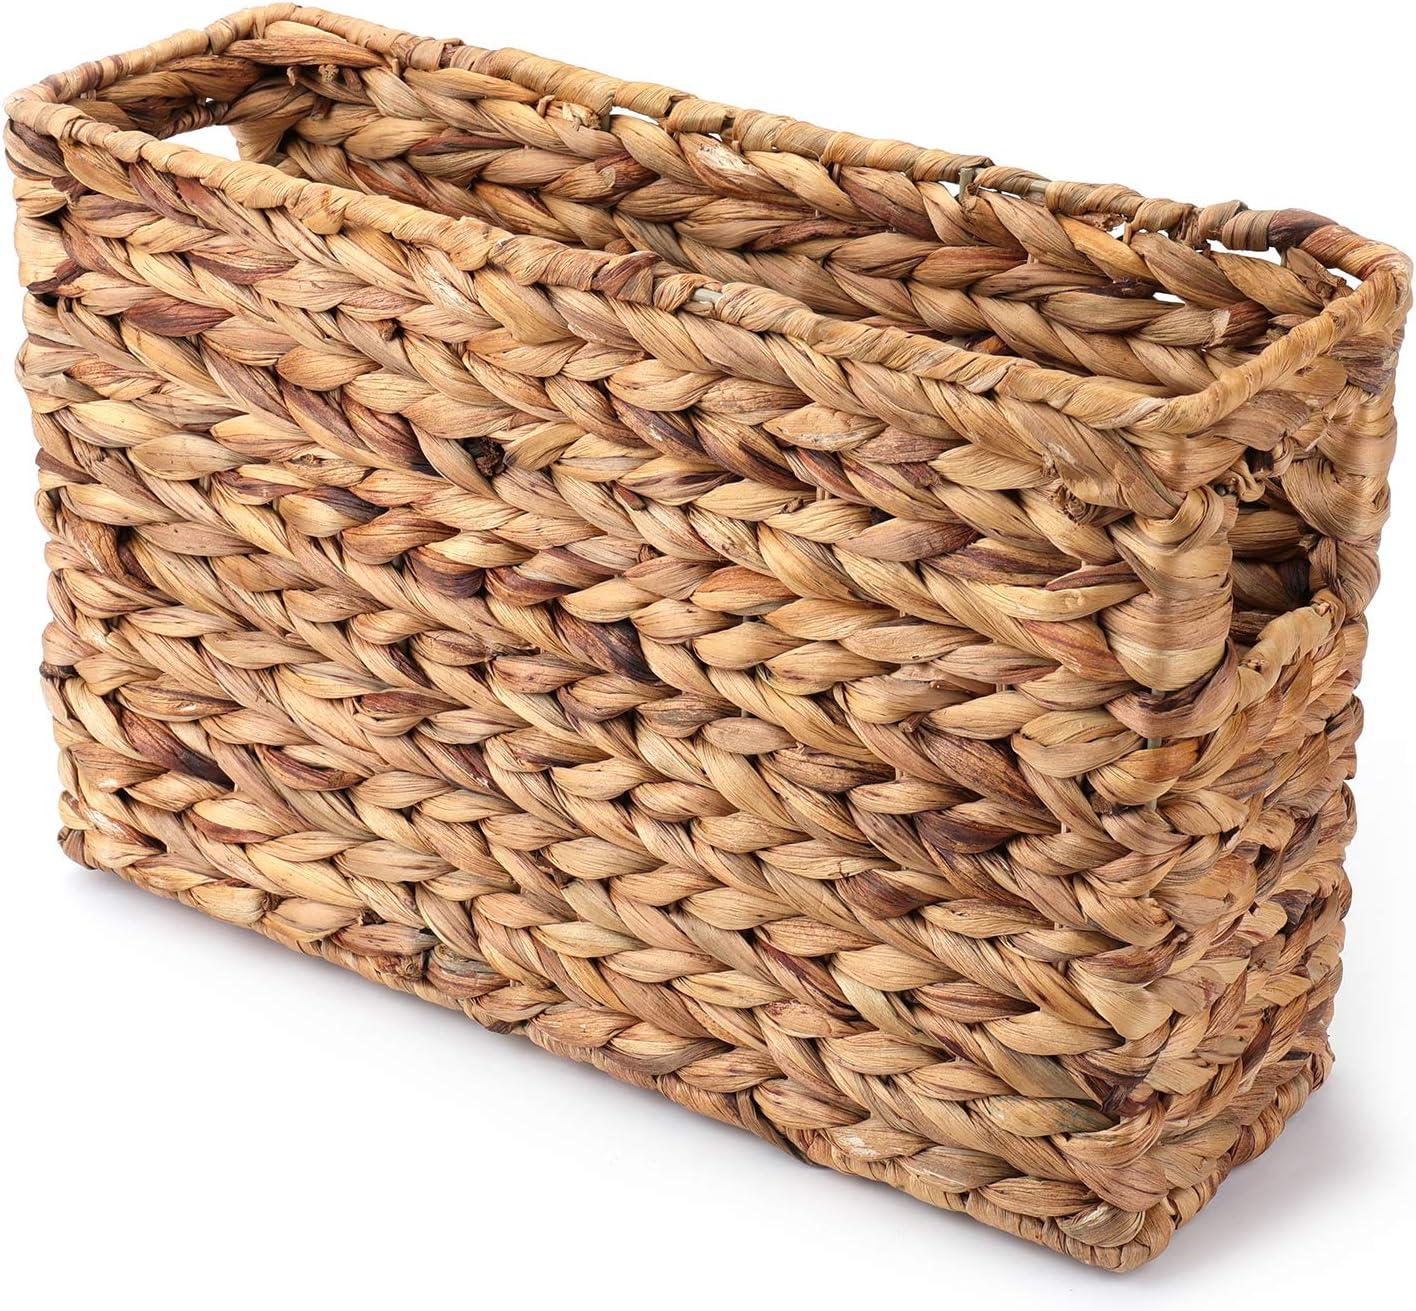 Yesland Magazine Water Hyacinth Basket - 15-1/4 x 4-7/8 x 9-7/8 Inch - Natural Woven Magazine Holder/Basket Bin for Home & Office